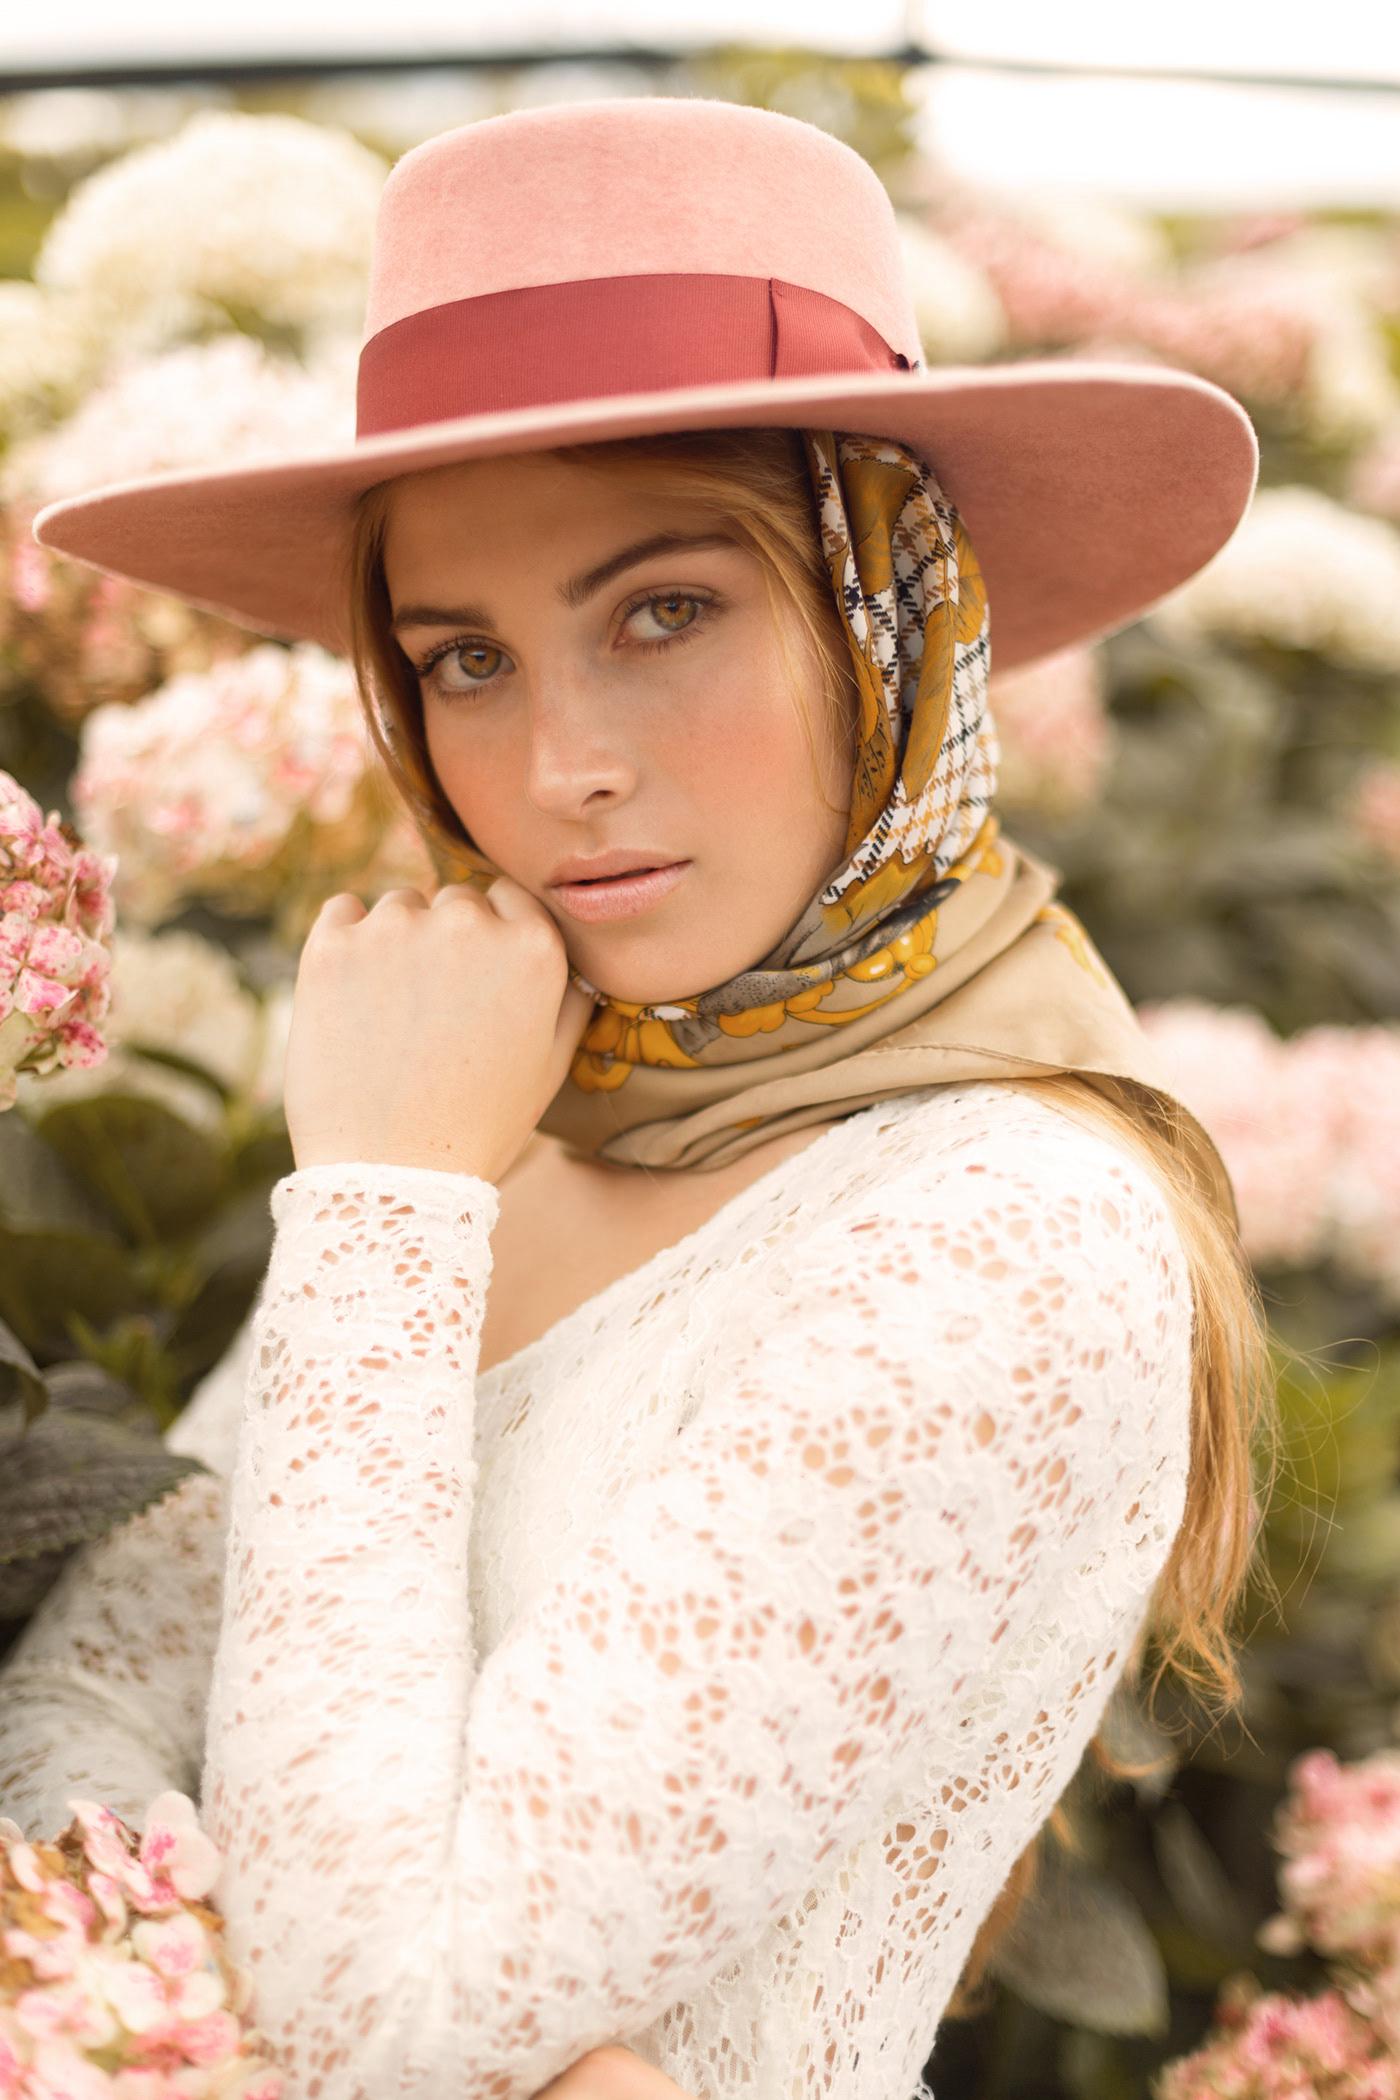 Photographer Daniel Bedoya / Model Amelia Piedrahita